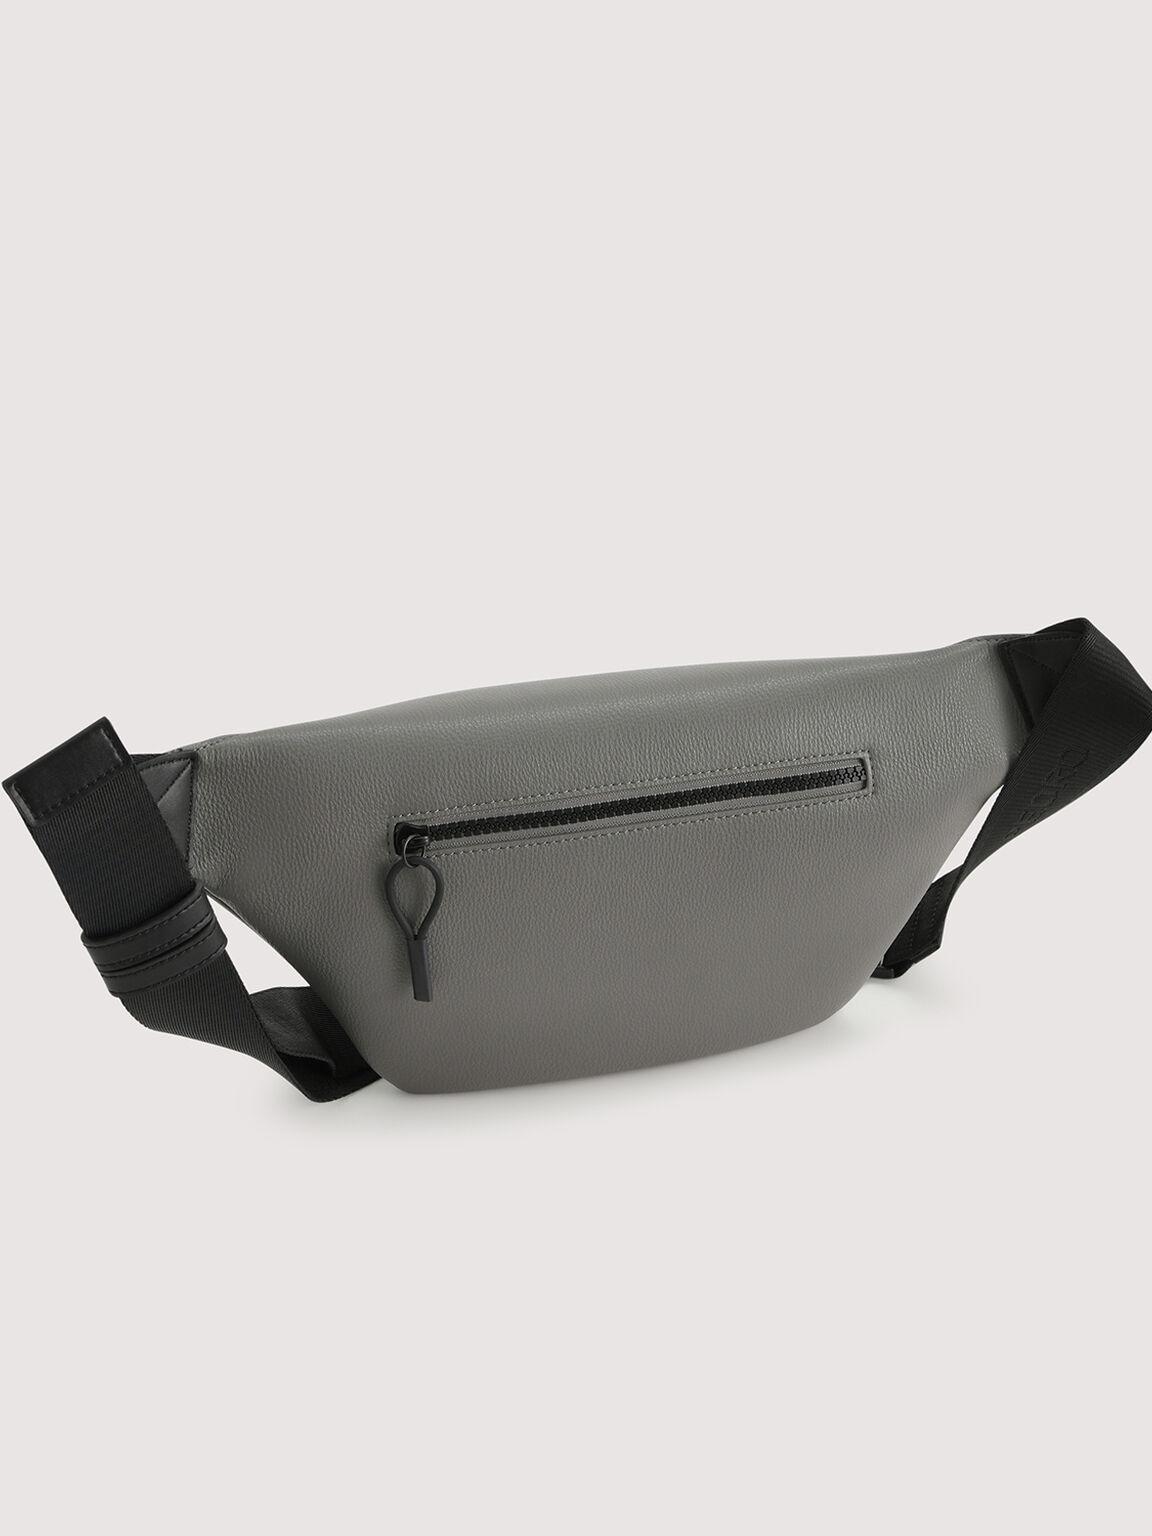 吊帶小包, 灰色, hi-res